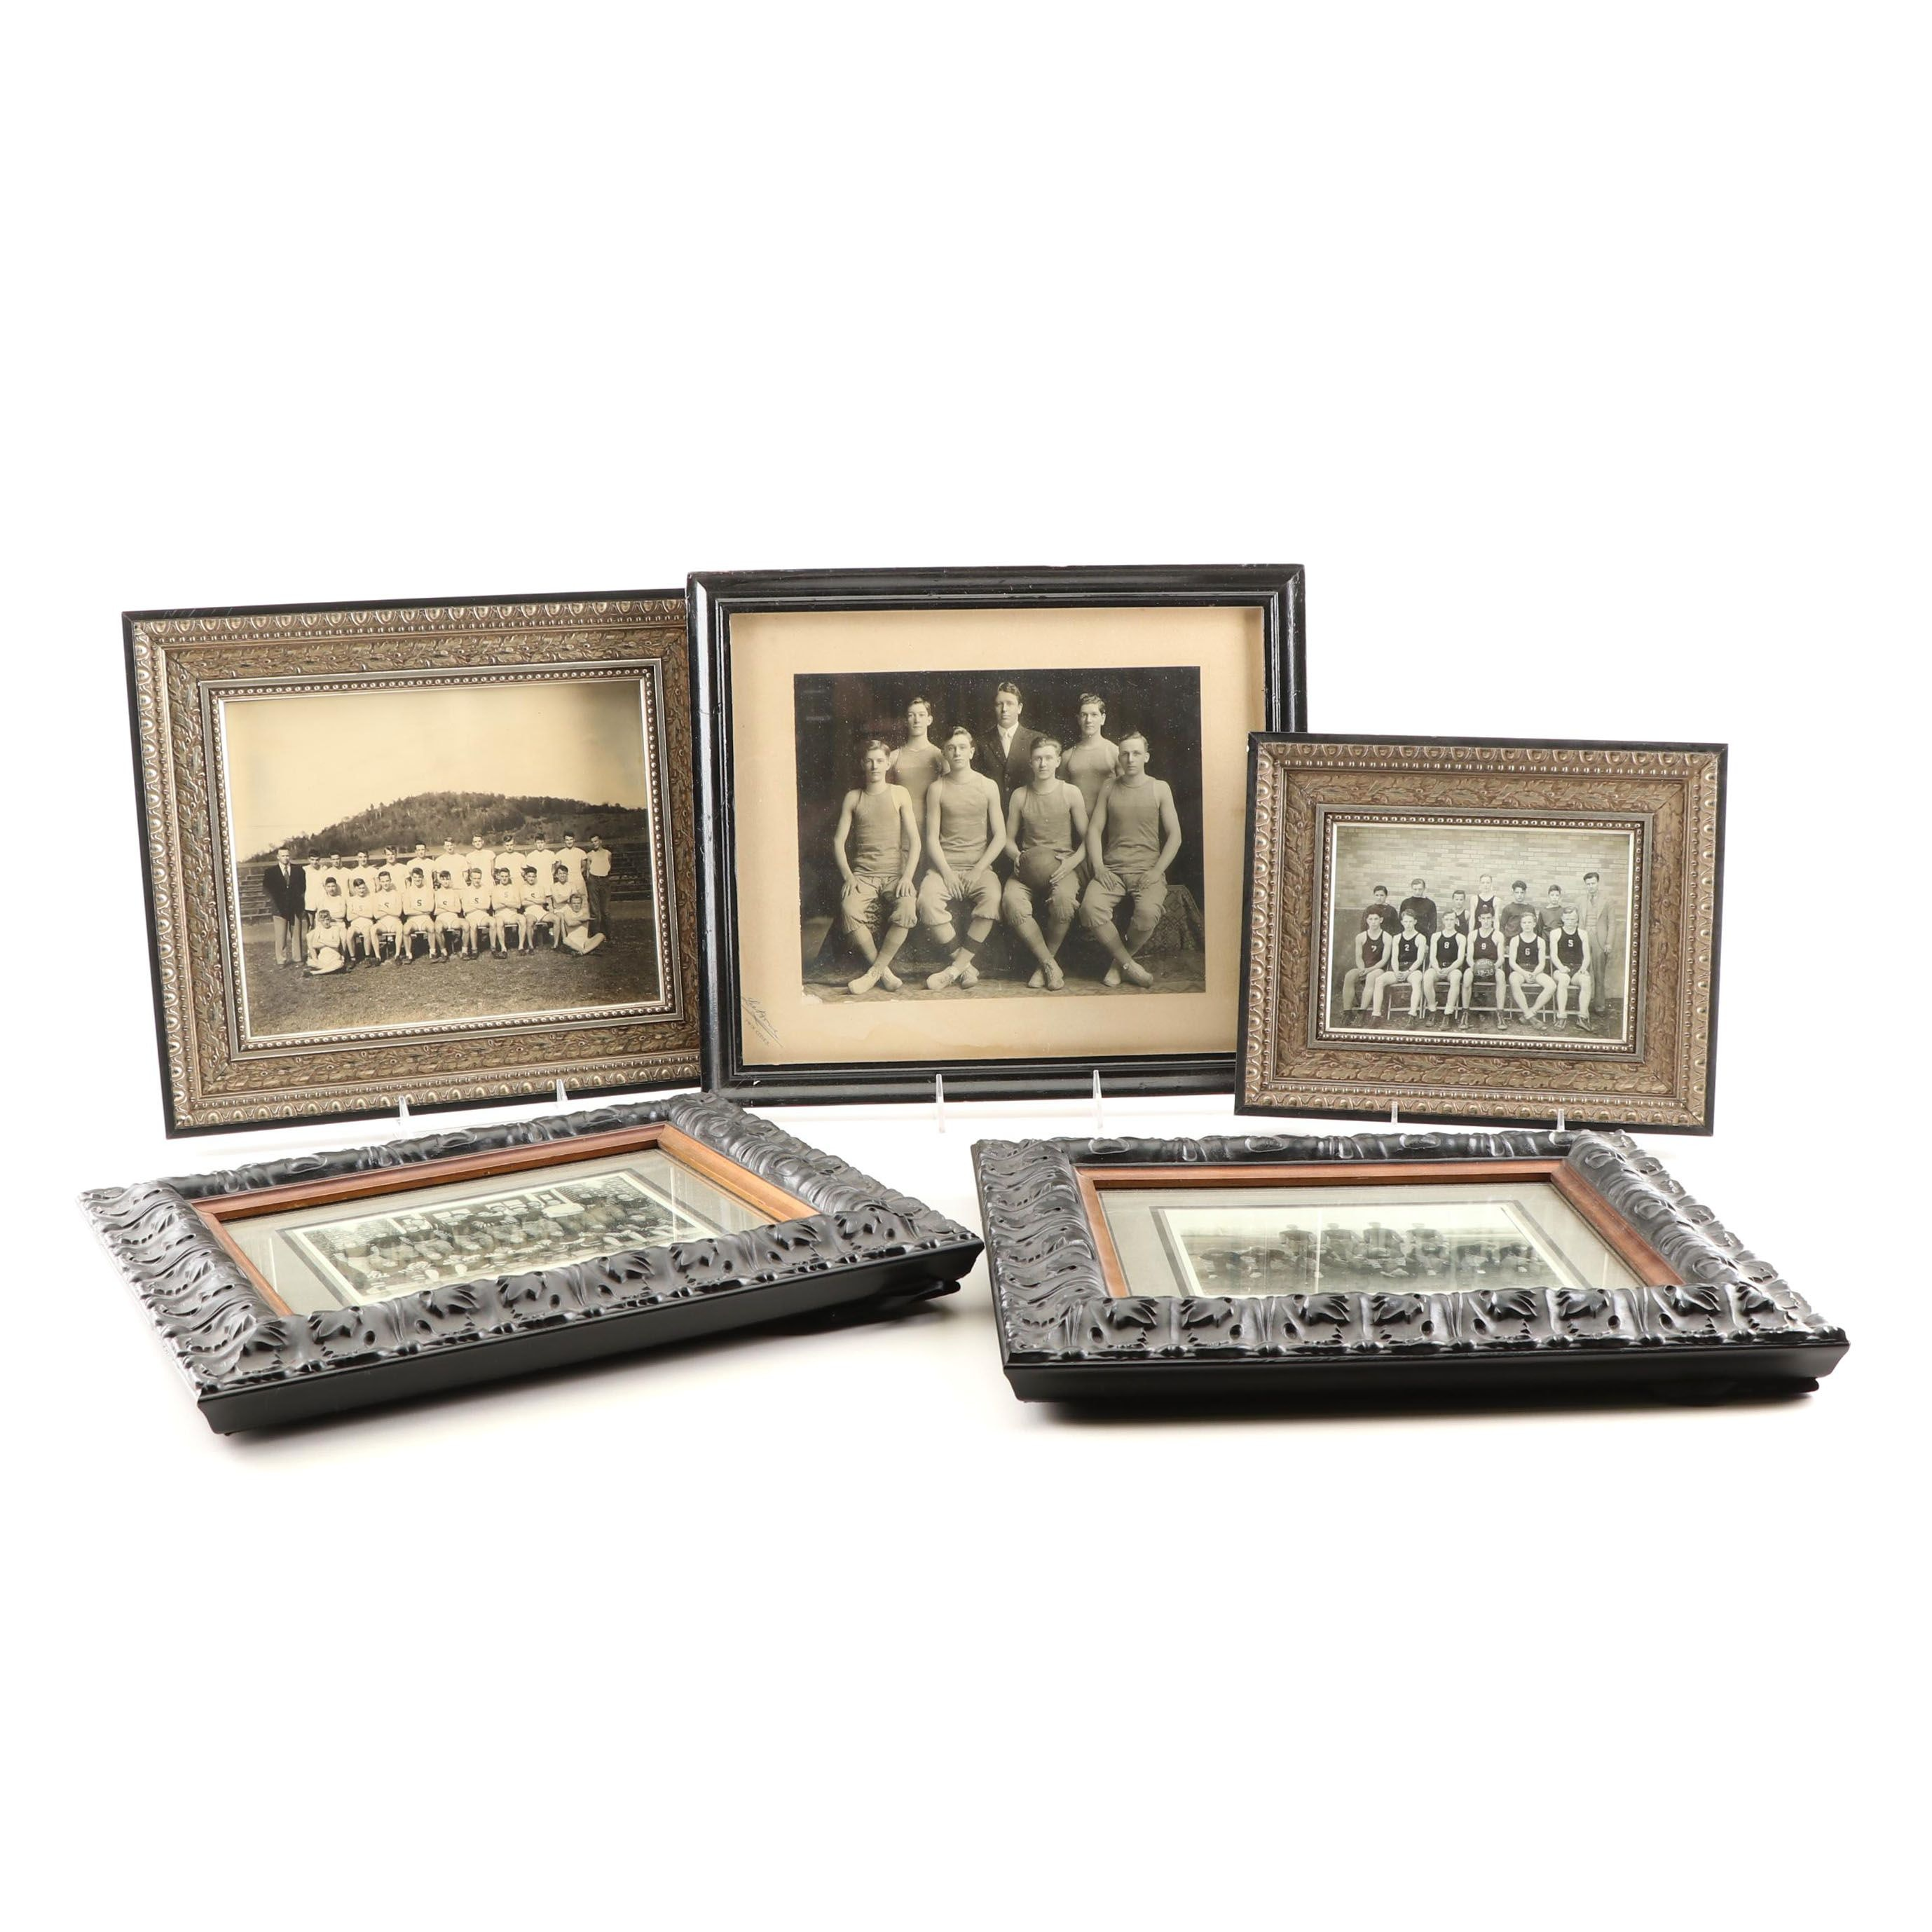 Vintage Photograph of Men's Athletic Teams